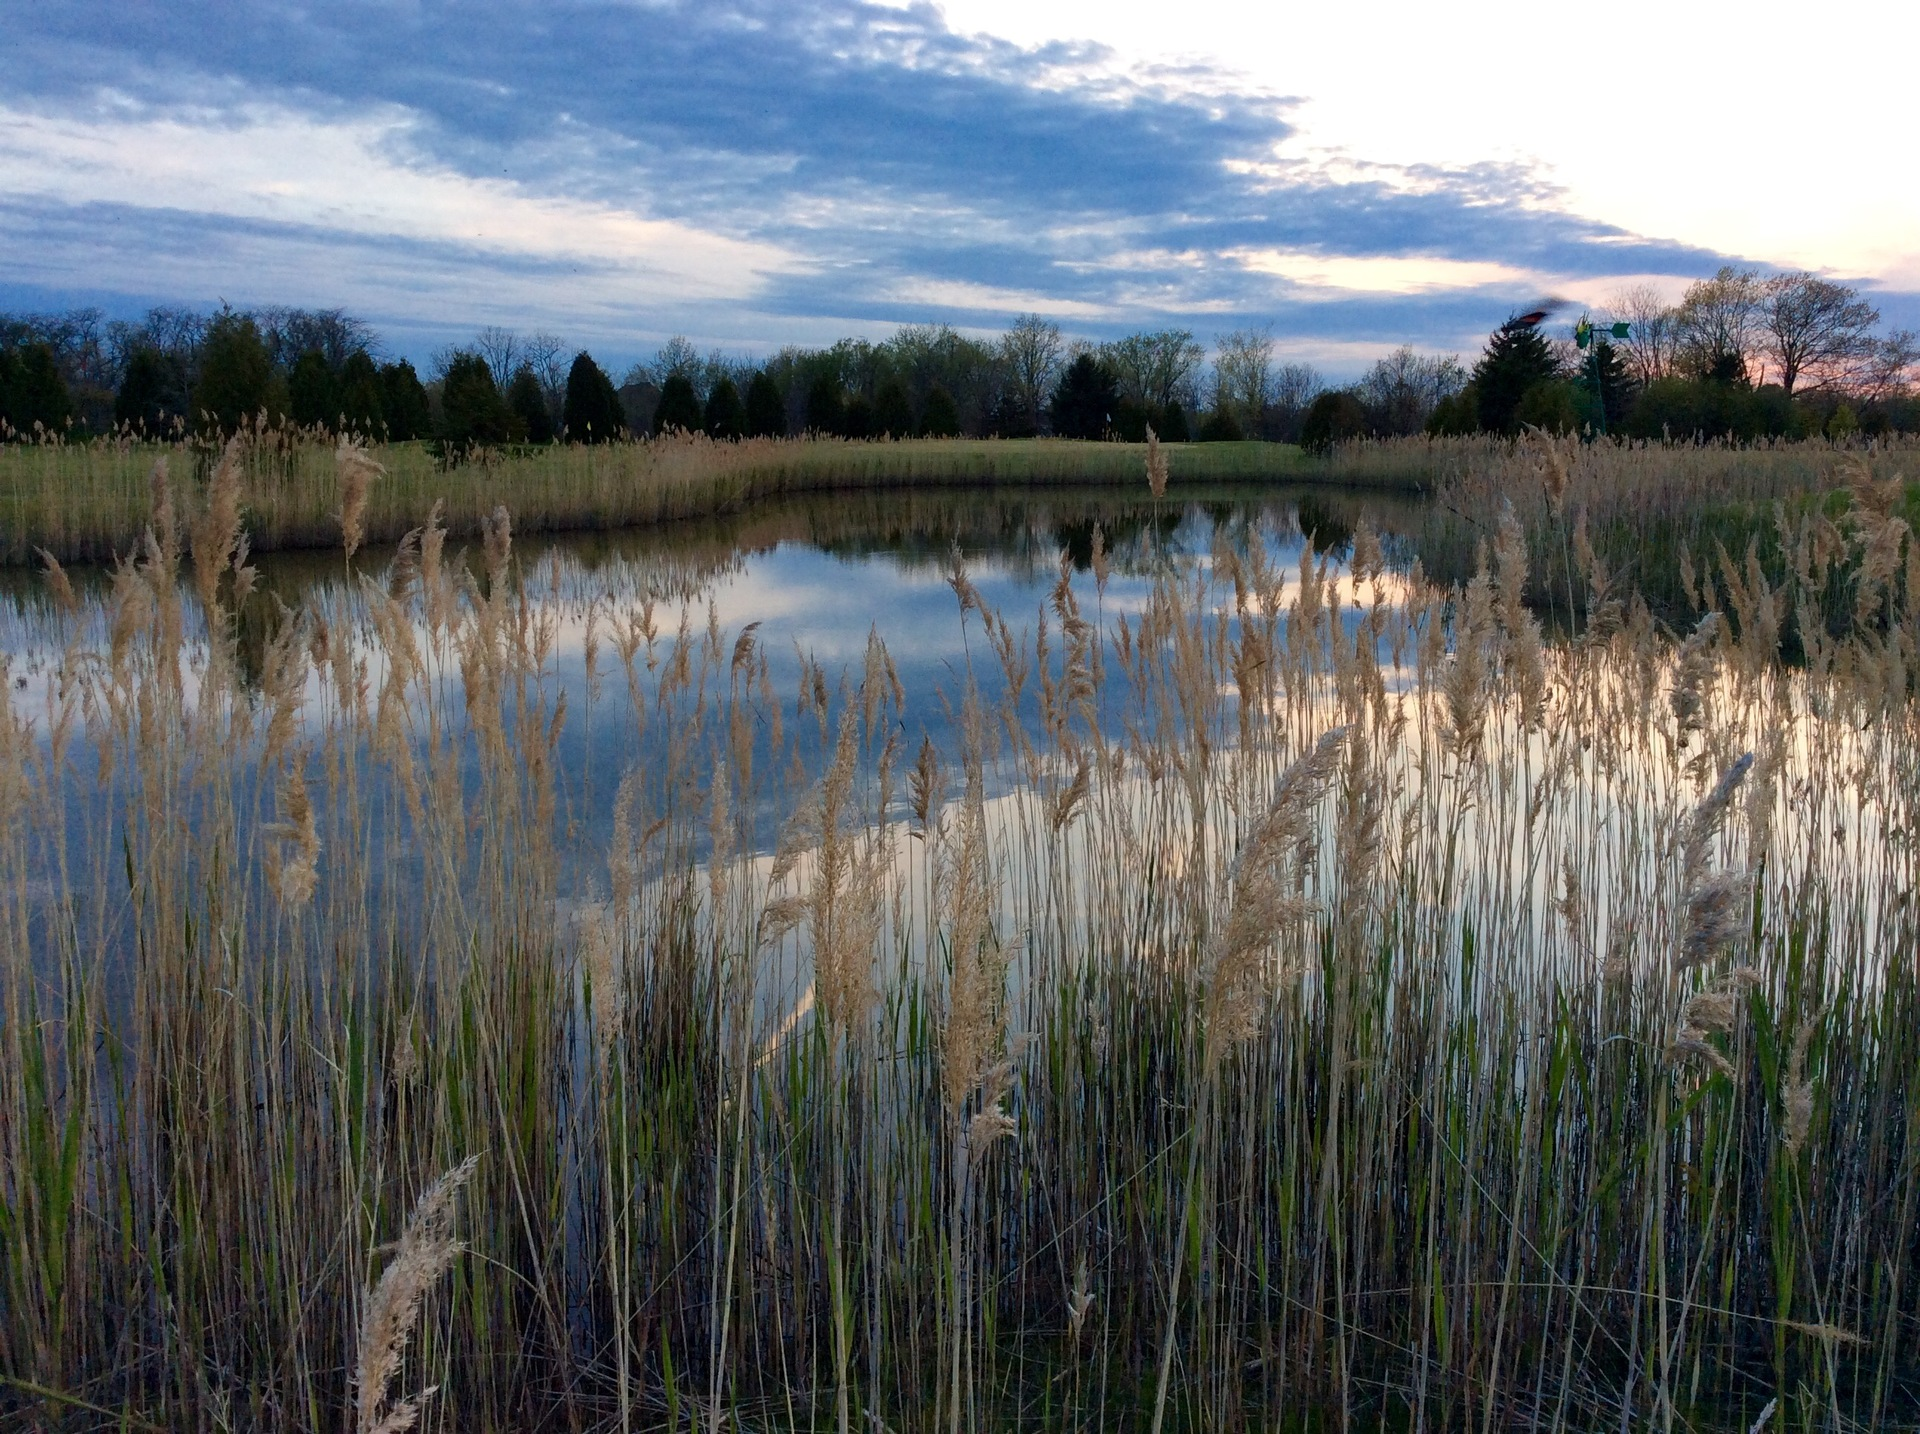 Blue Sky | drazpet, grass, lake, landscape